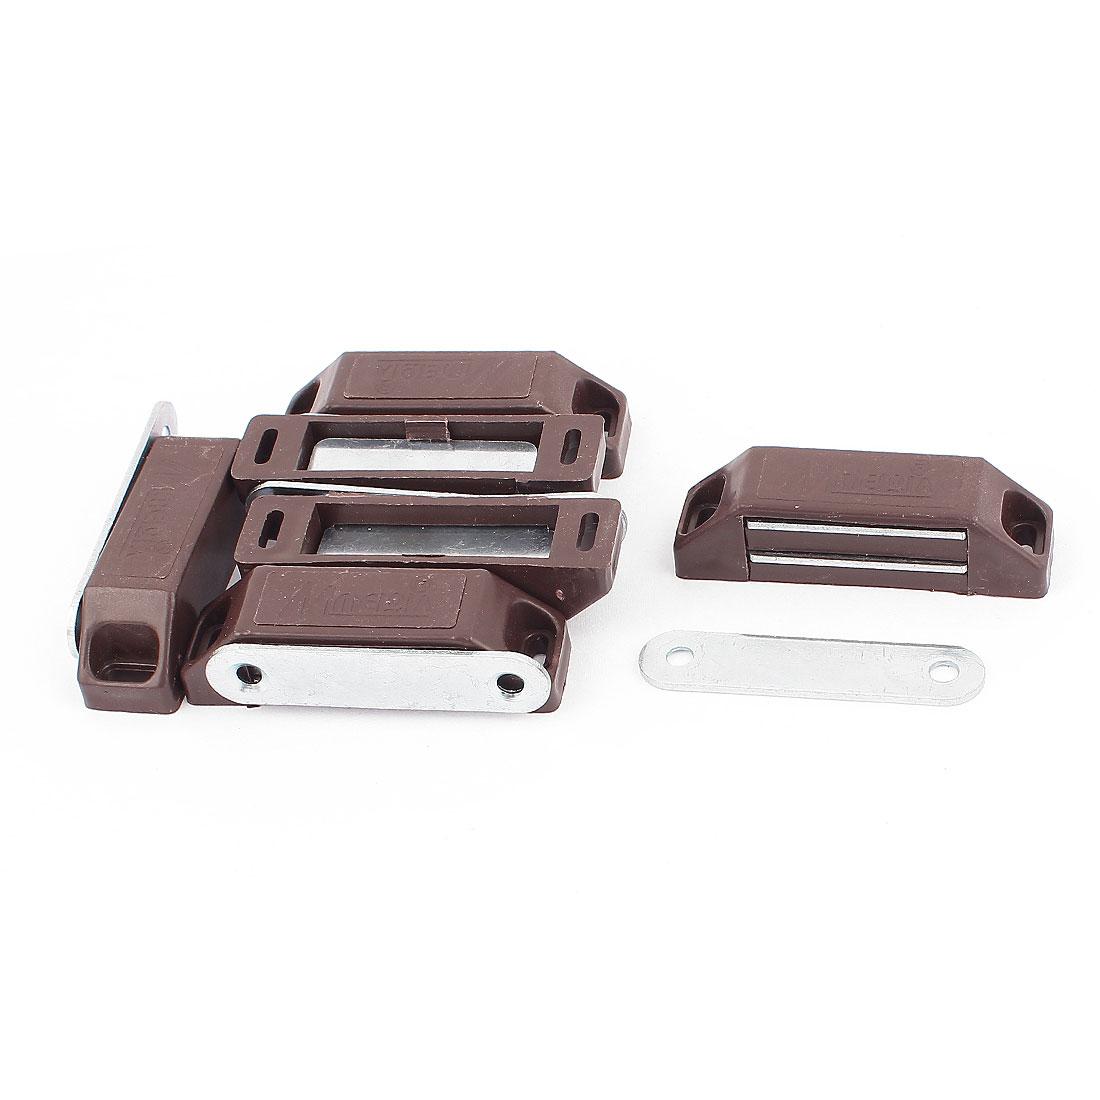 60mm x 16mm Door Cupboard Cabinet Wardrobe Magnetic Latch Catch Brown 6Pcs